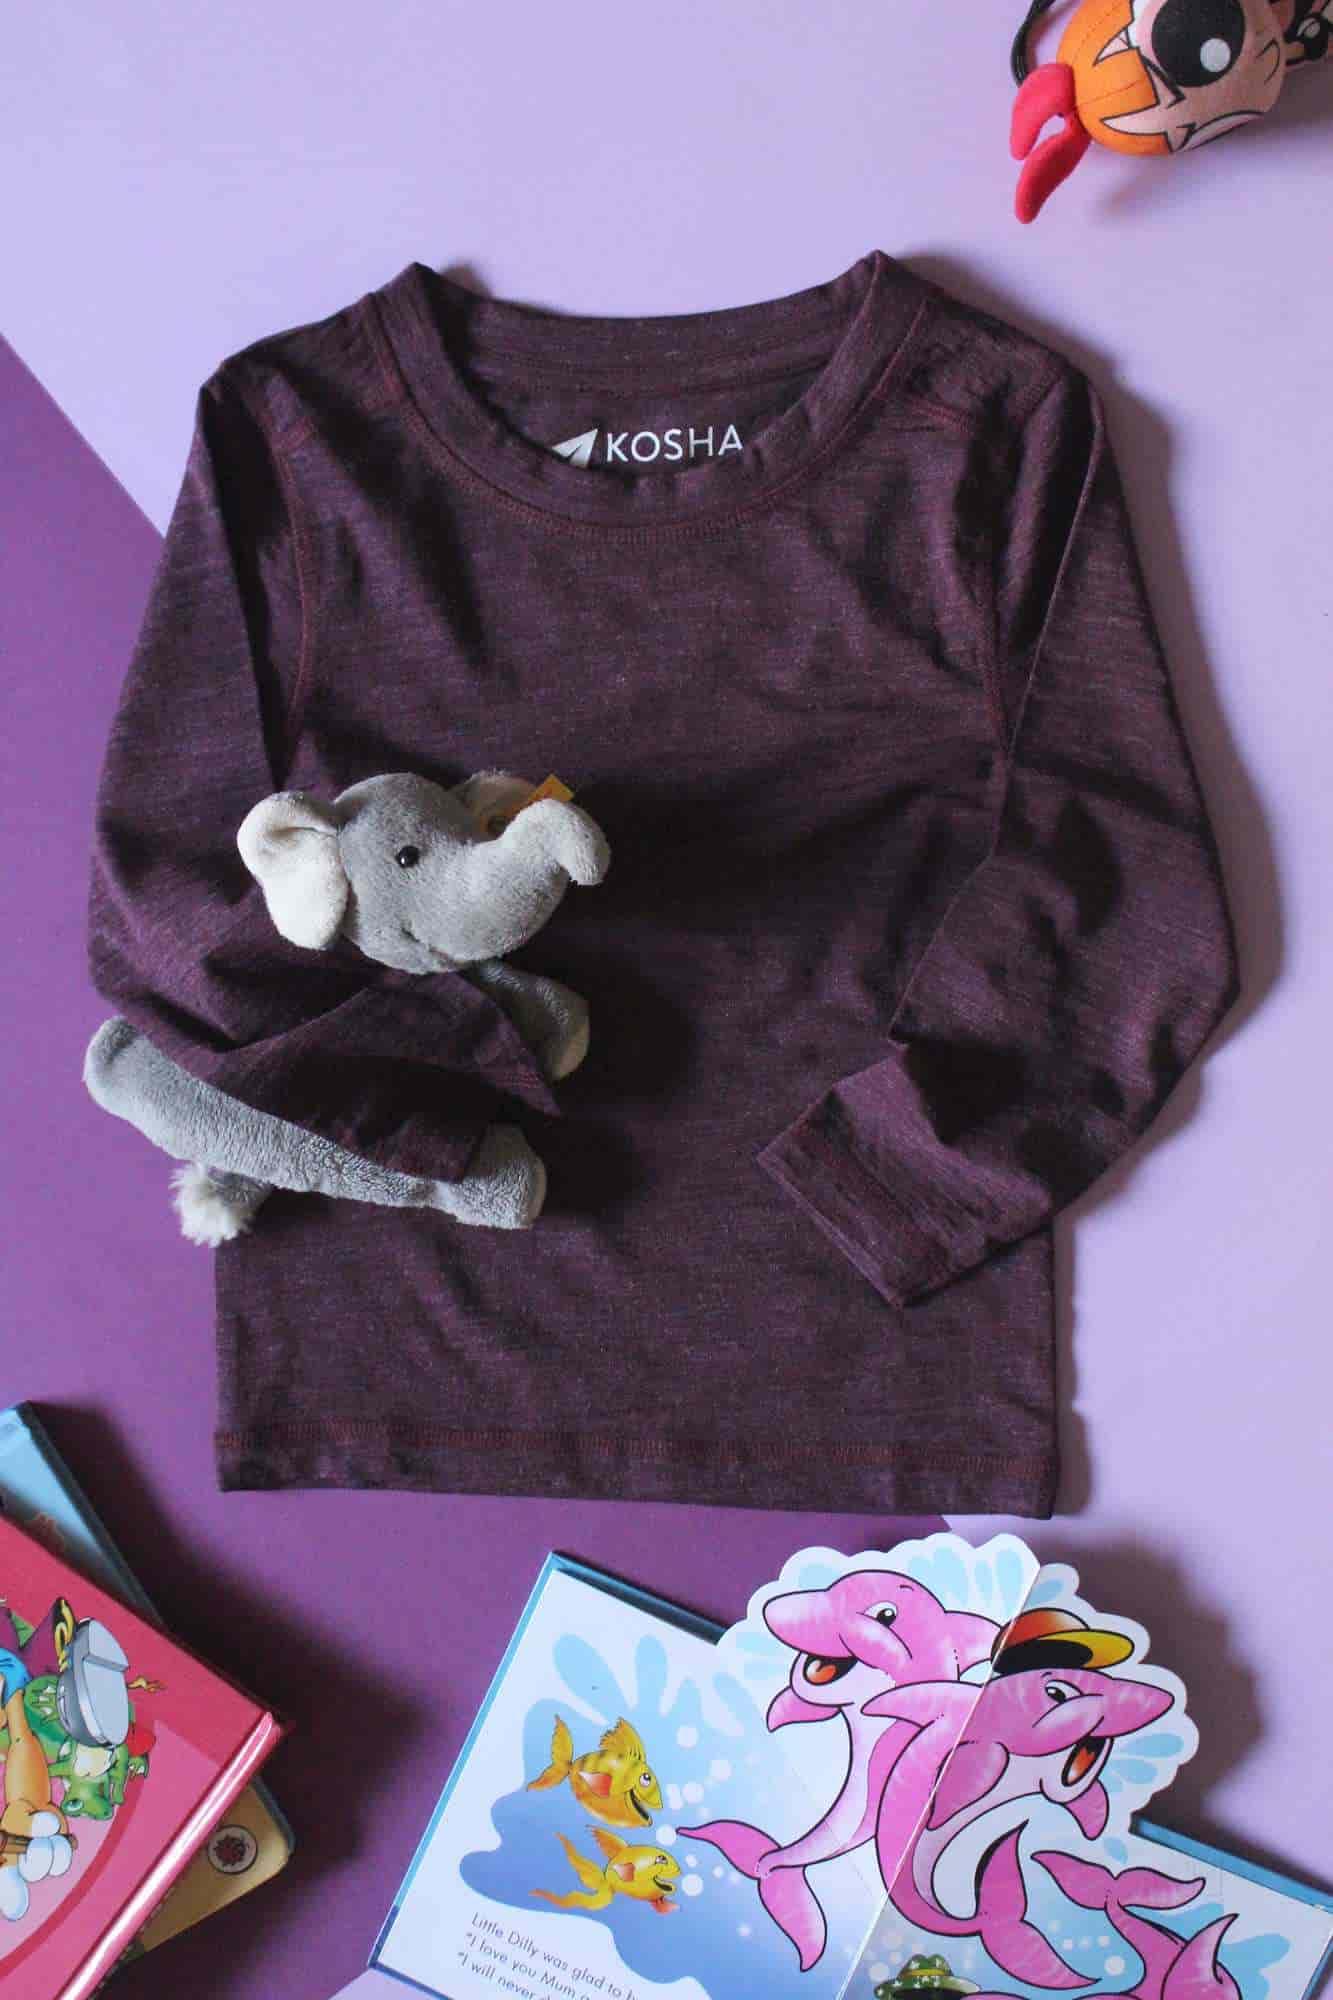 a7566fc2123 Kosha - Winter Travel Wear